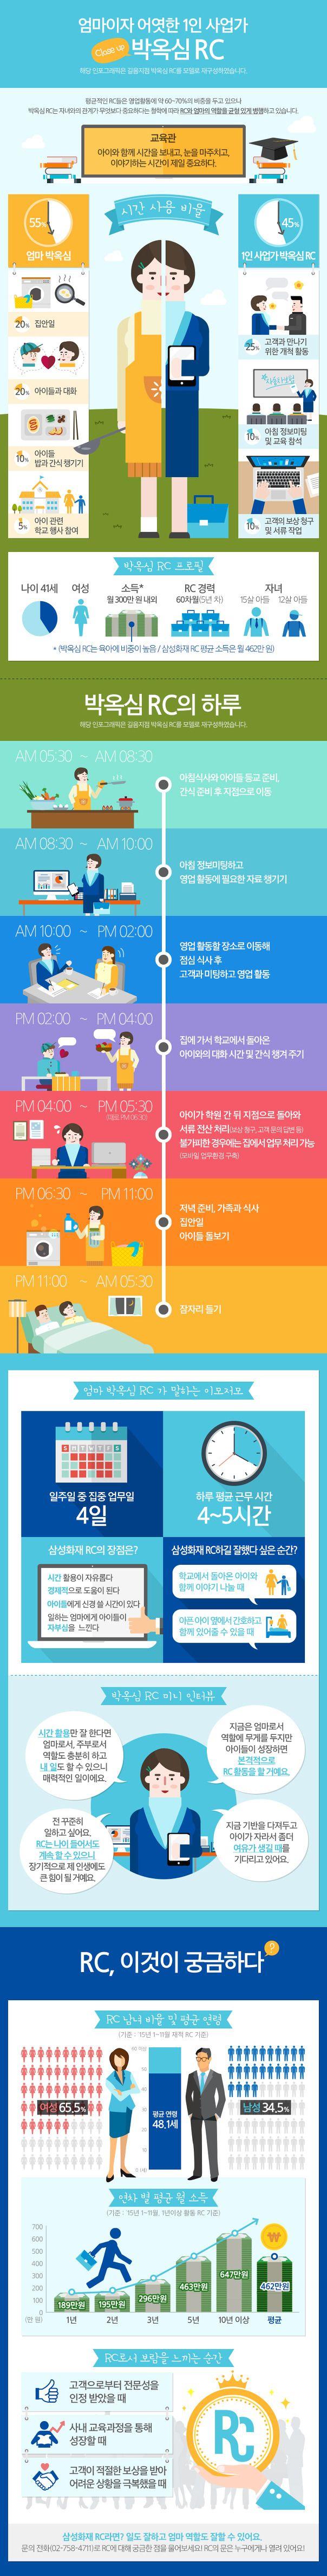 [Infographic] 엄마이자 어엿한 1인 사업가 박옥심 RC에 관한 인포그래픽